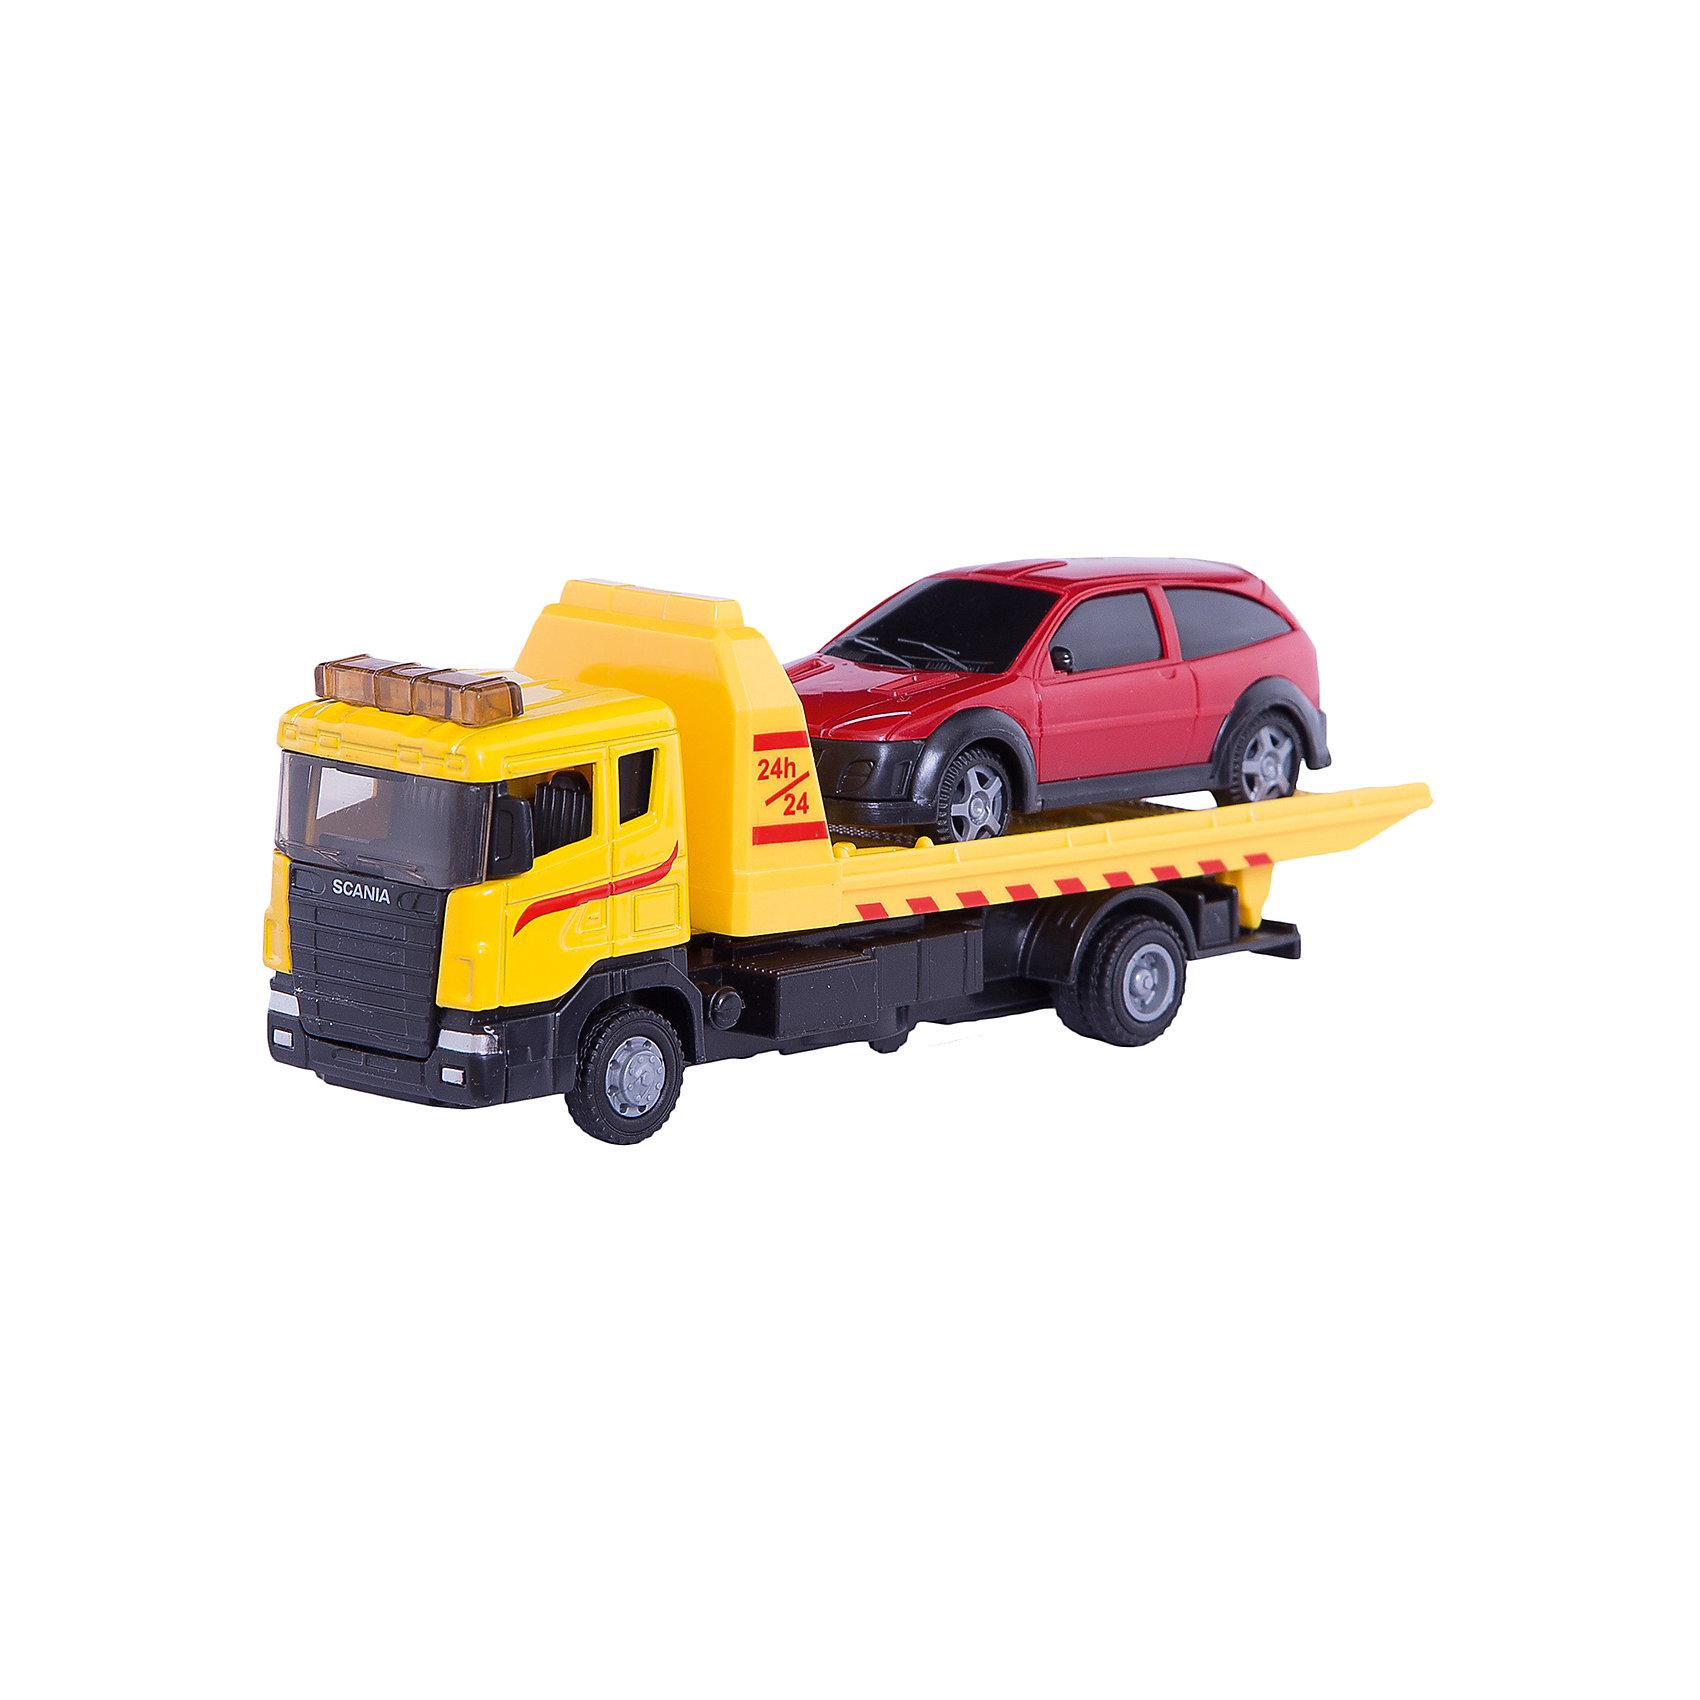 Машинка Scania Tow Truck с Машинкаинкой 1:48, AutotimeМашинки<br><br><br>Ширина мм: 362<br>Глубина мм: 114<br>Высота мм: 146<br>Вес г: 15<br>Возраст от месяцев: 36<br>Возраст до месяцев: 2147483647<br>Пол: Мужской<br>Возраст: Детский<br>SKU: 5584125